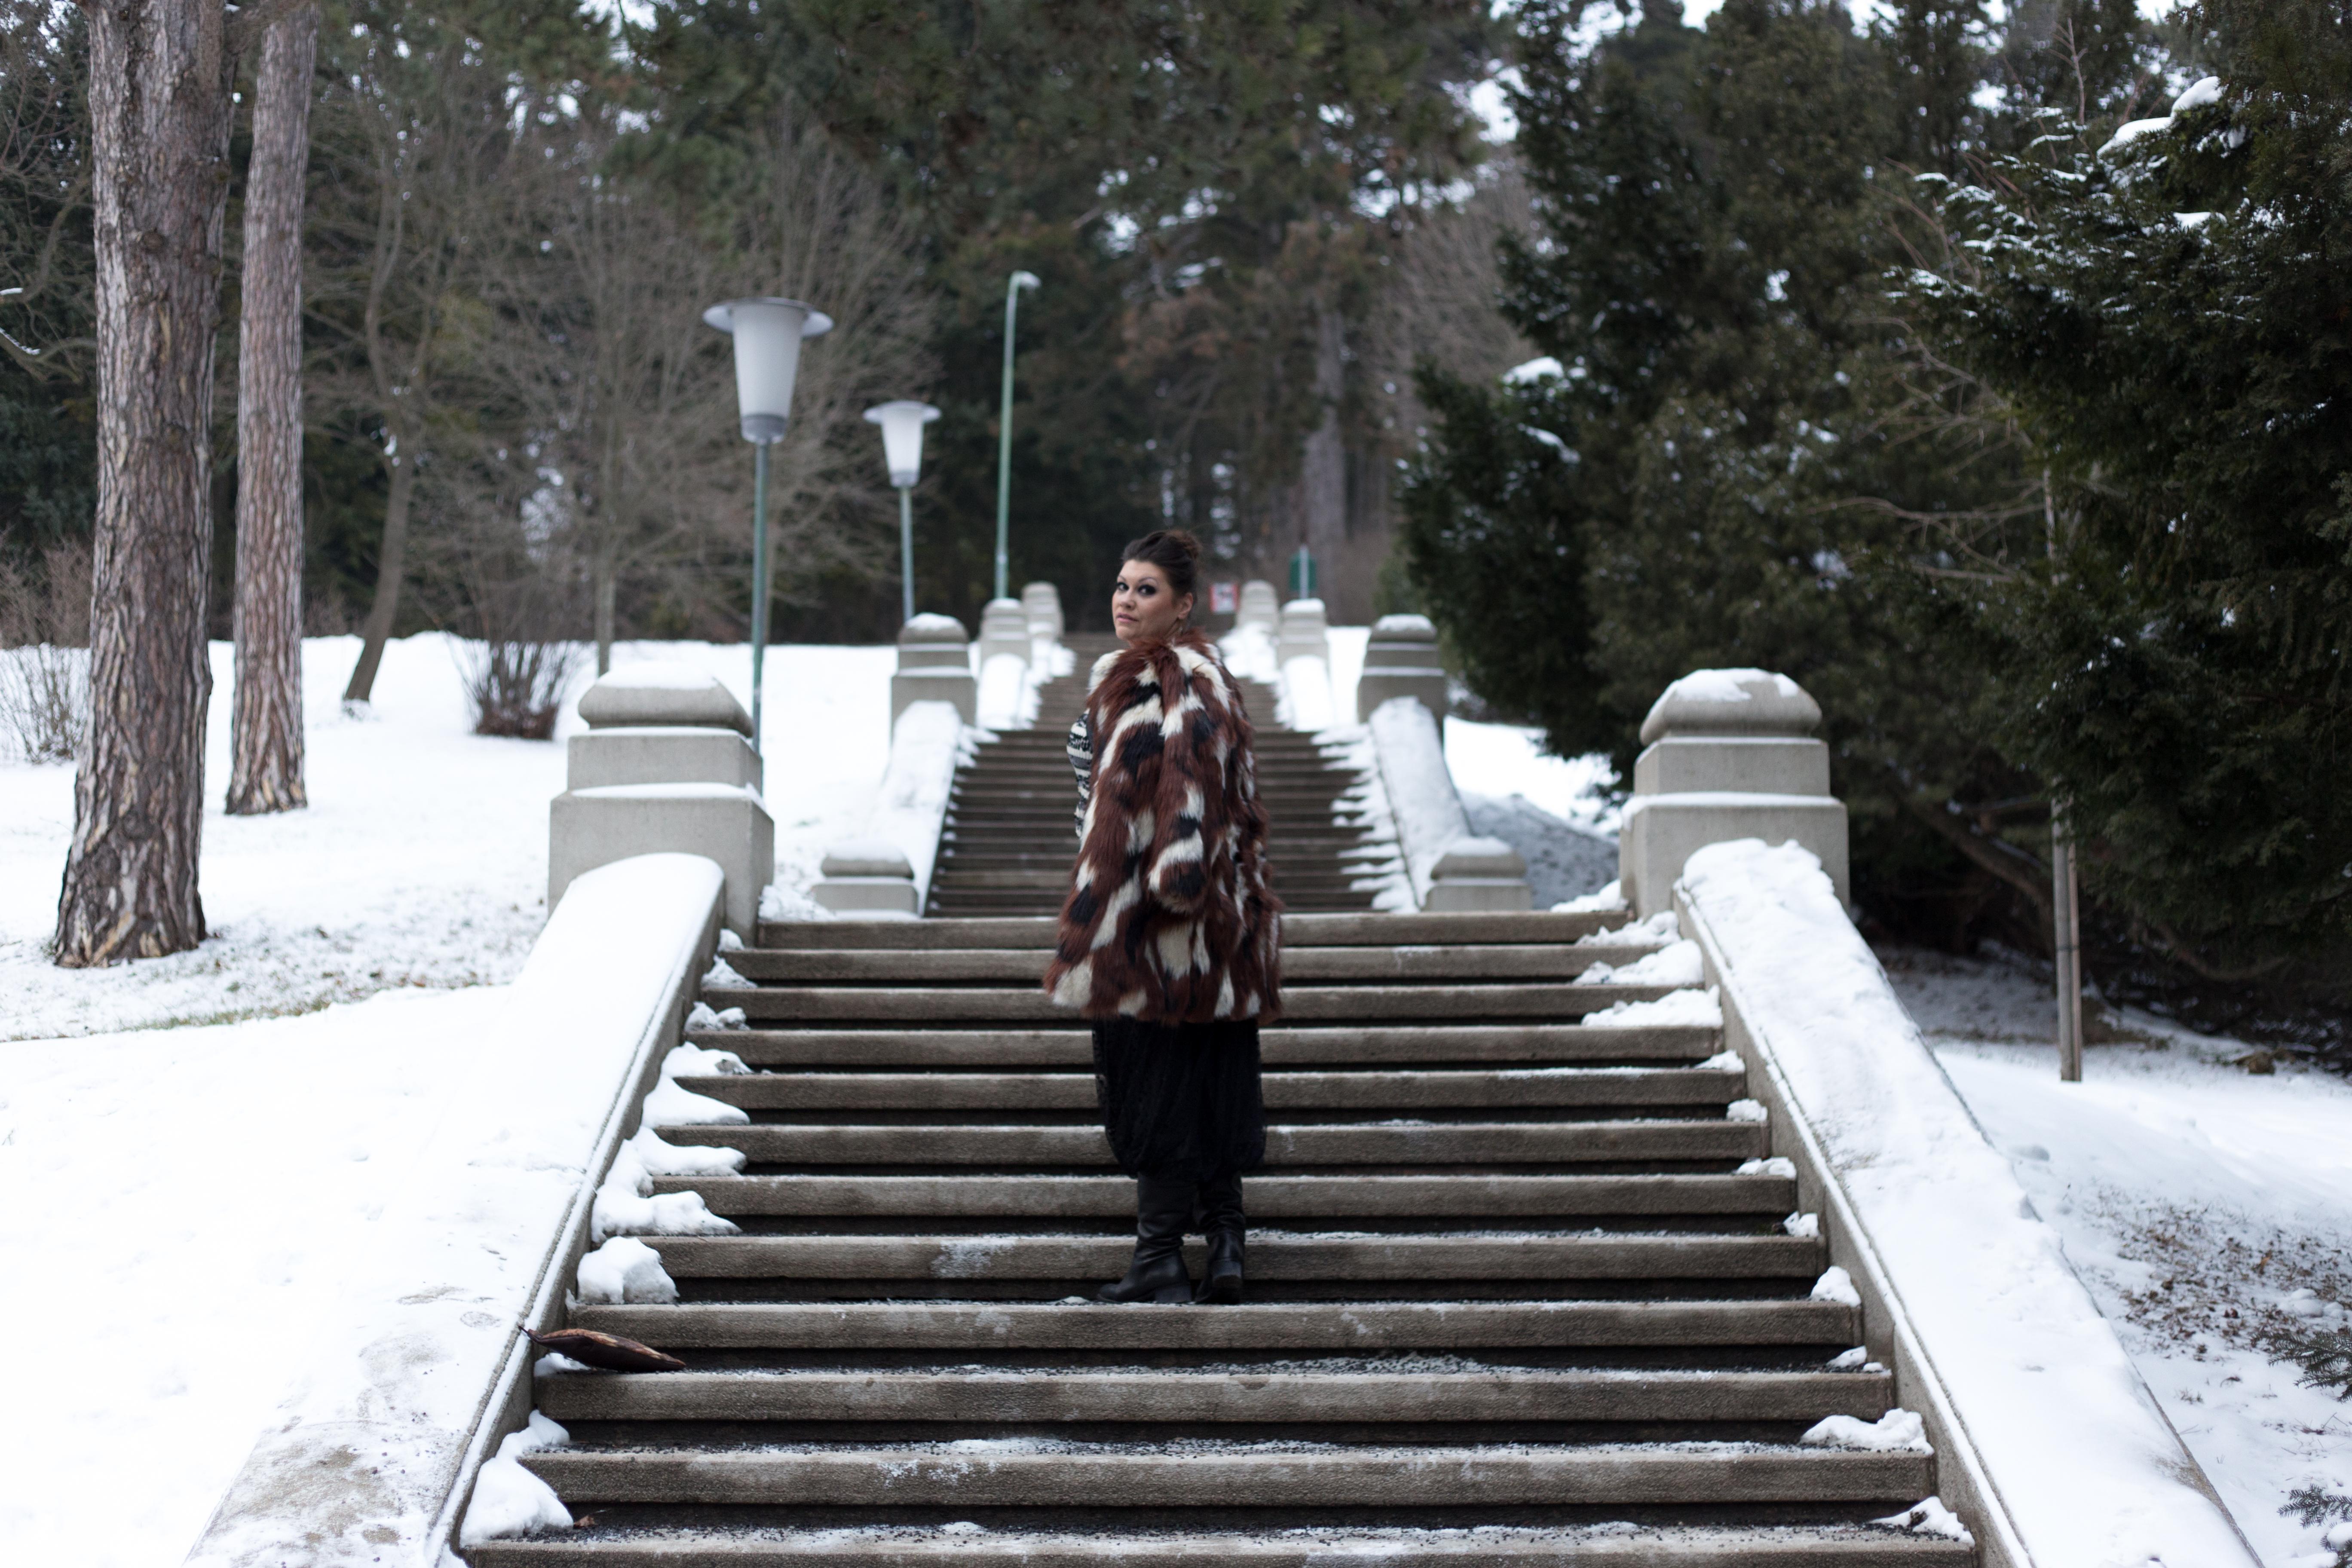 madonna blogger award navabi fauxfur plussize fashion devil queen outfit look pelz fakefur snowwhite kardiaserena (7)